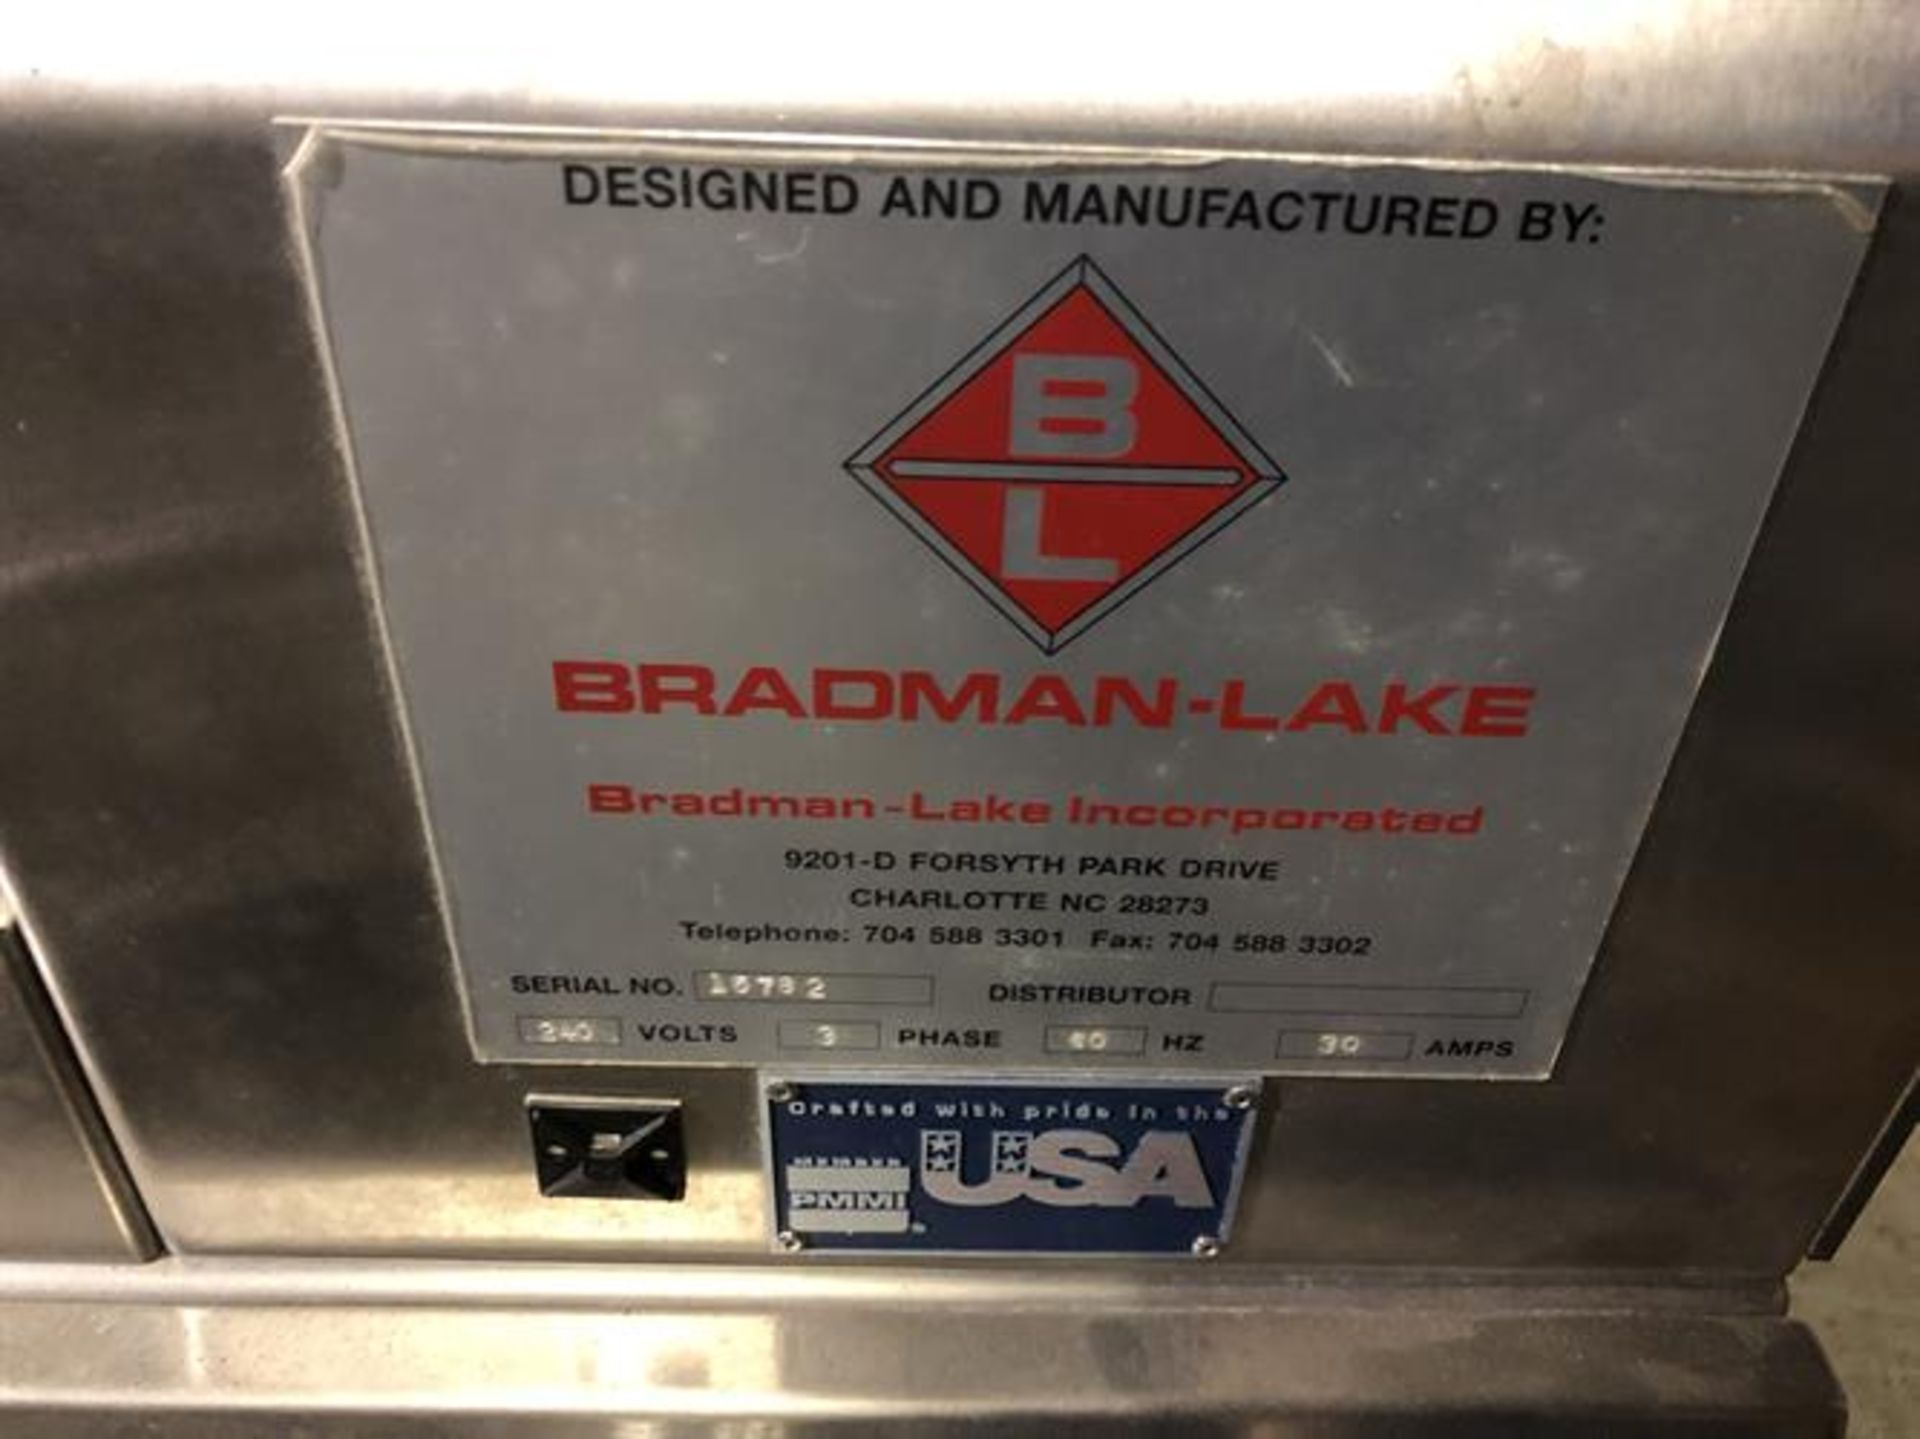 Bradman Lake inline Top Flap Sealer carton closer - Nordson Hot Melt - Allen Bradley Panelview - Image 13 of 19